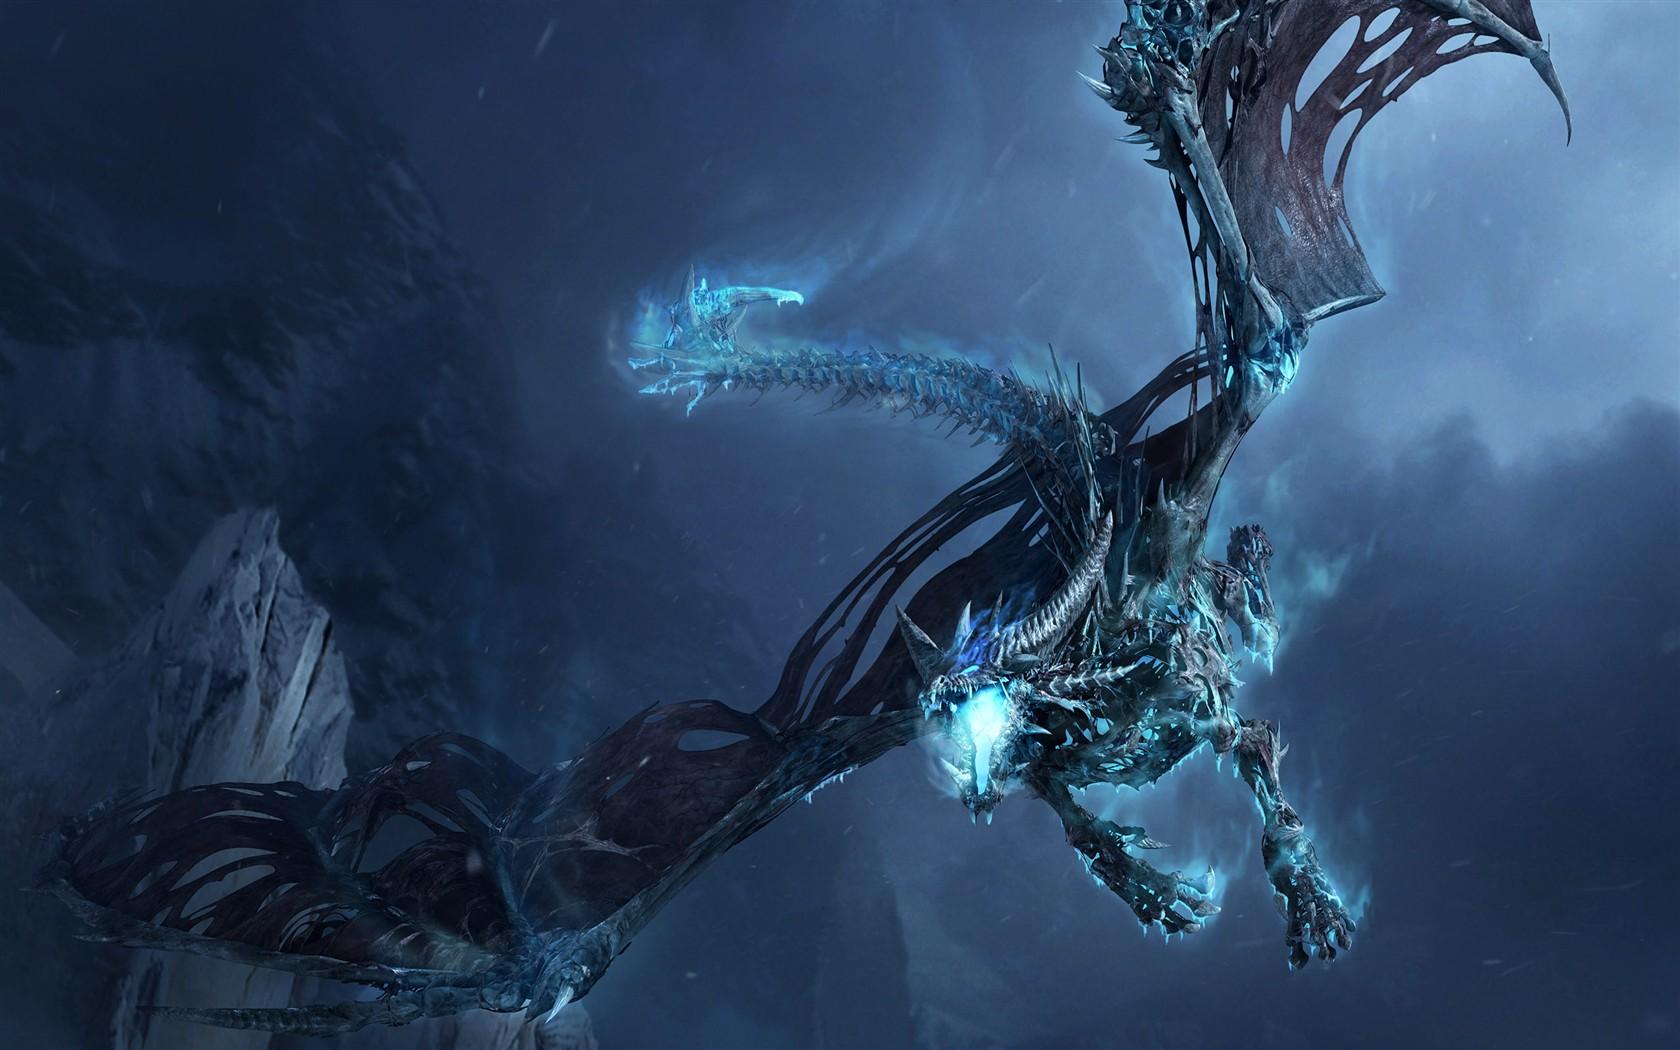 World of Warcraft Album Fond d'écran HD #4 - 1680x1050 Fond d'écran Télécharger - World of ...